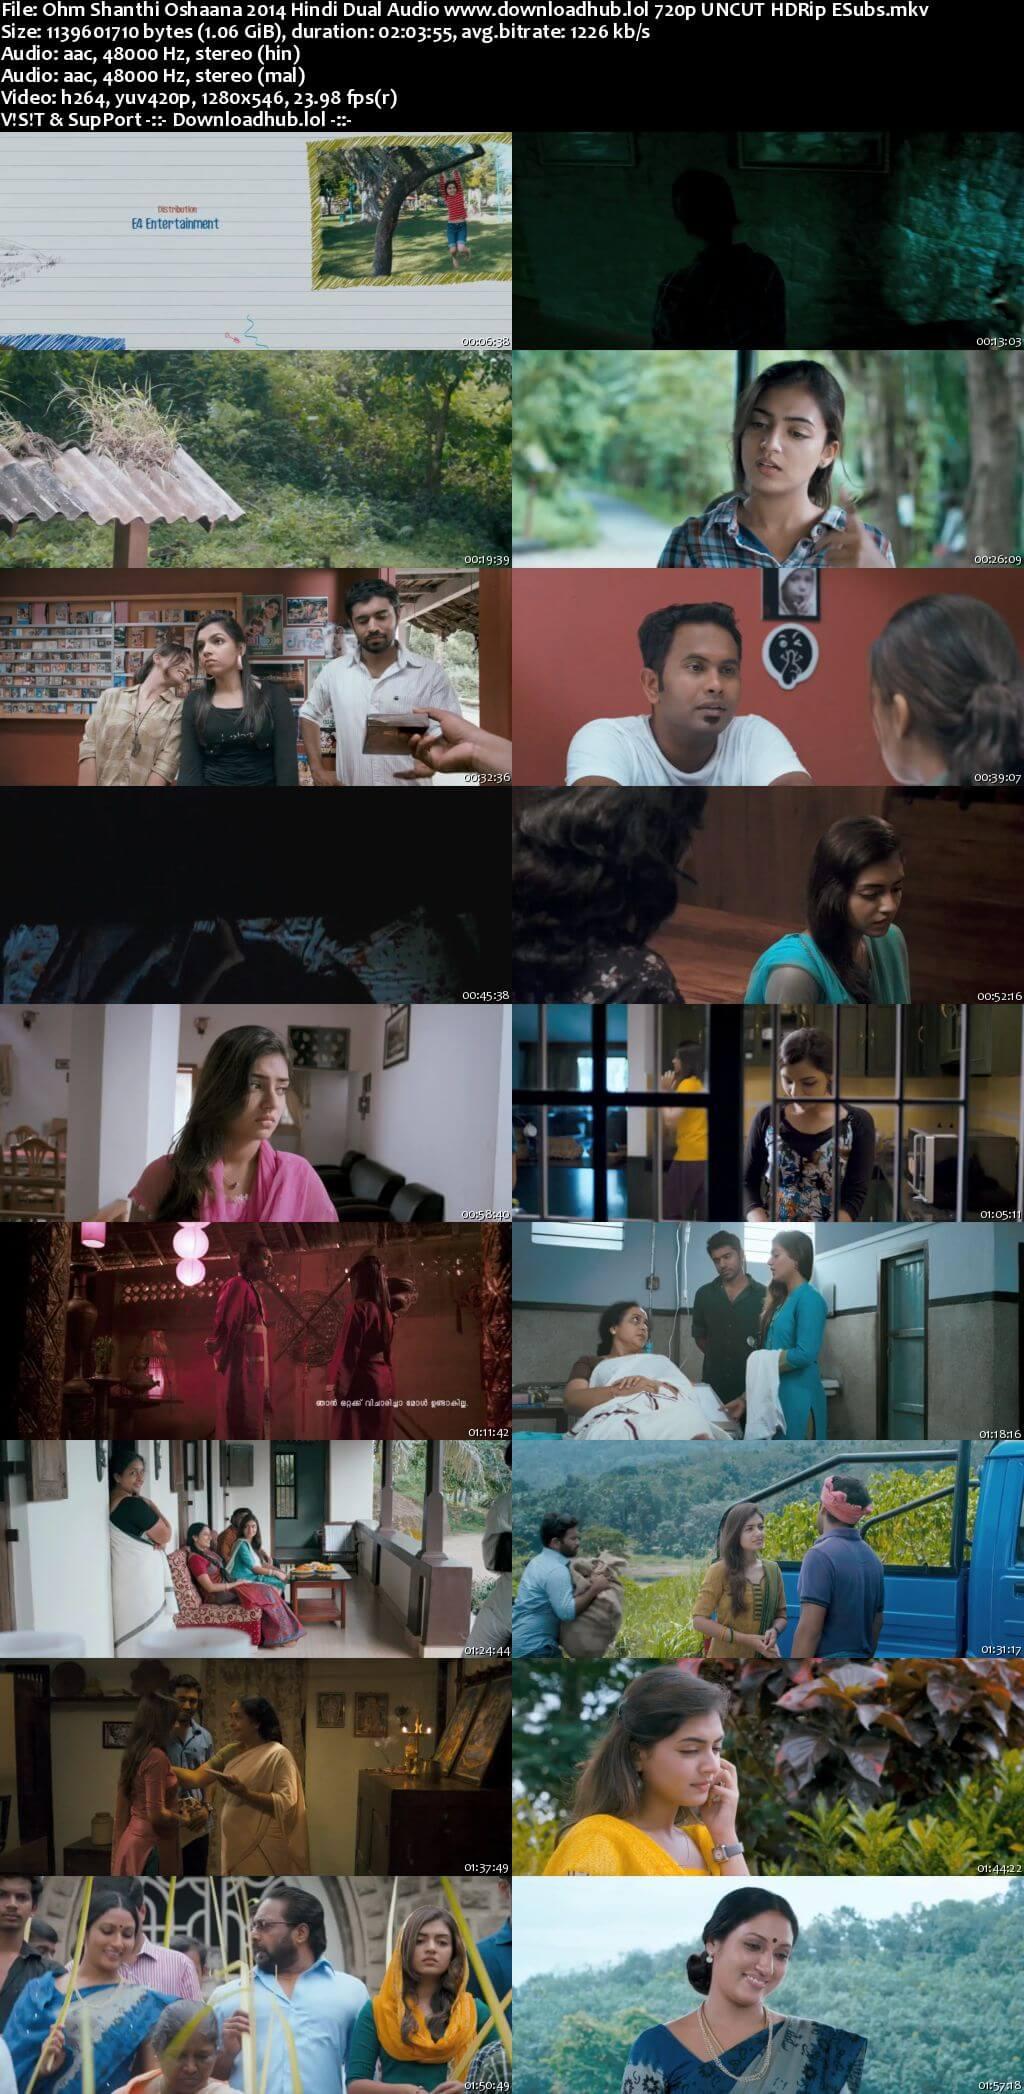 Ohm Shanthi Oshaana 2014 Hindi Dual Audio 720p UNCUT HDRip ESubs